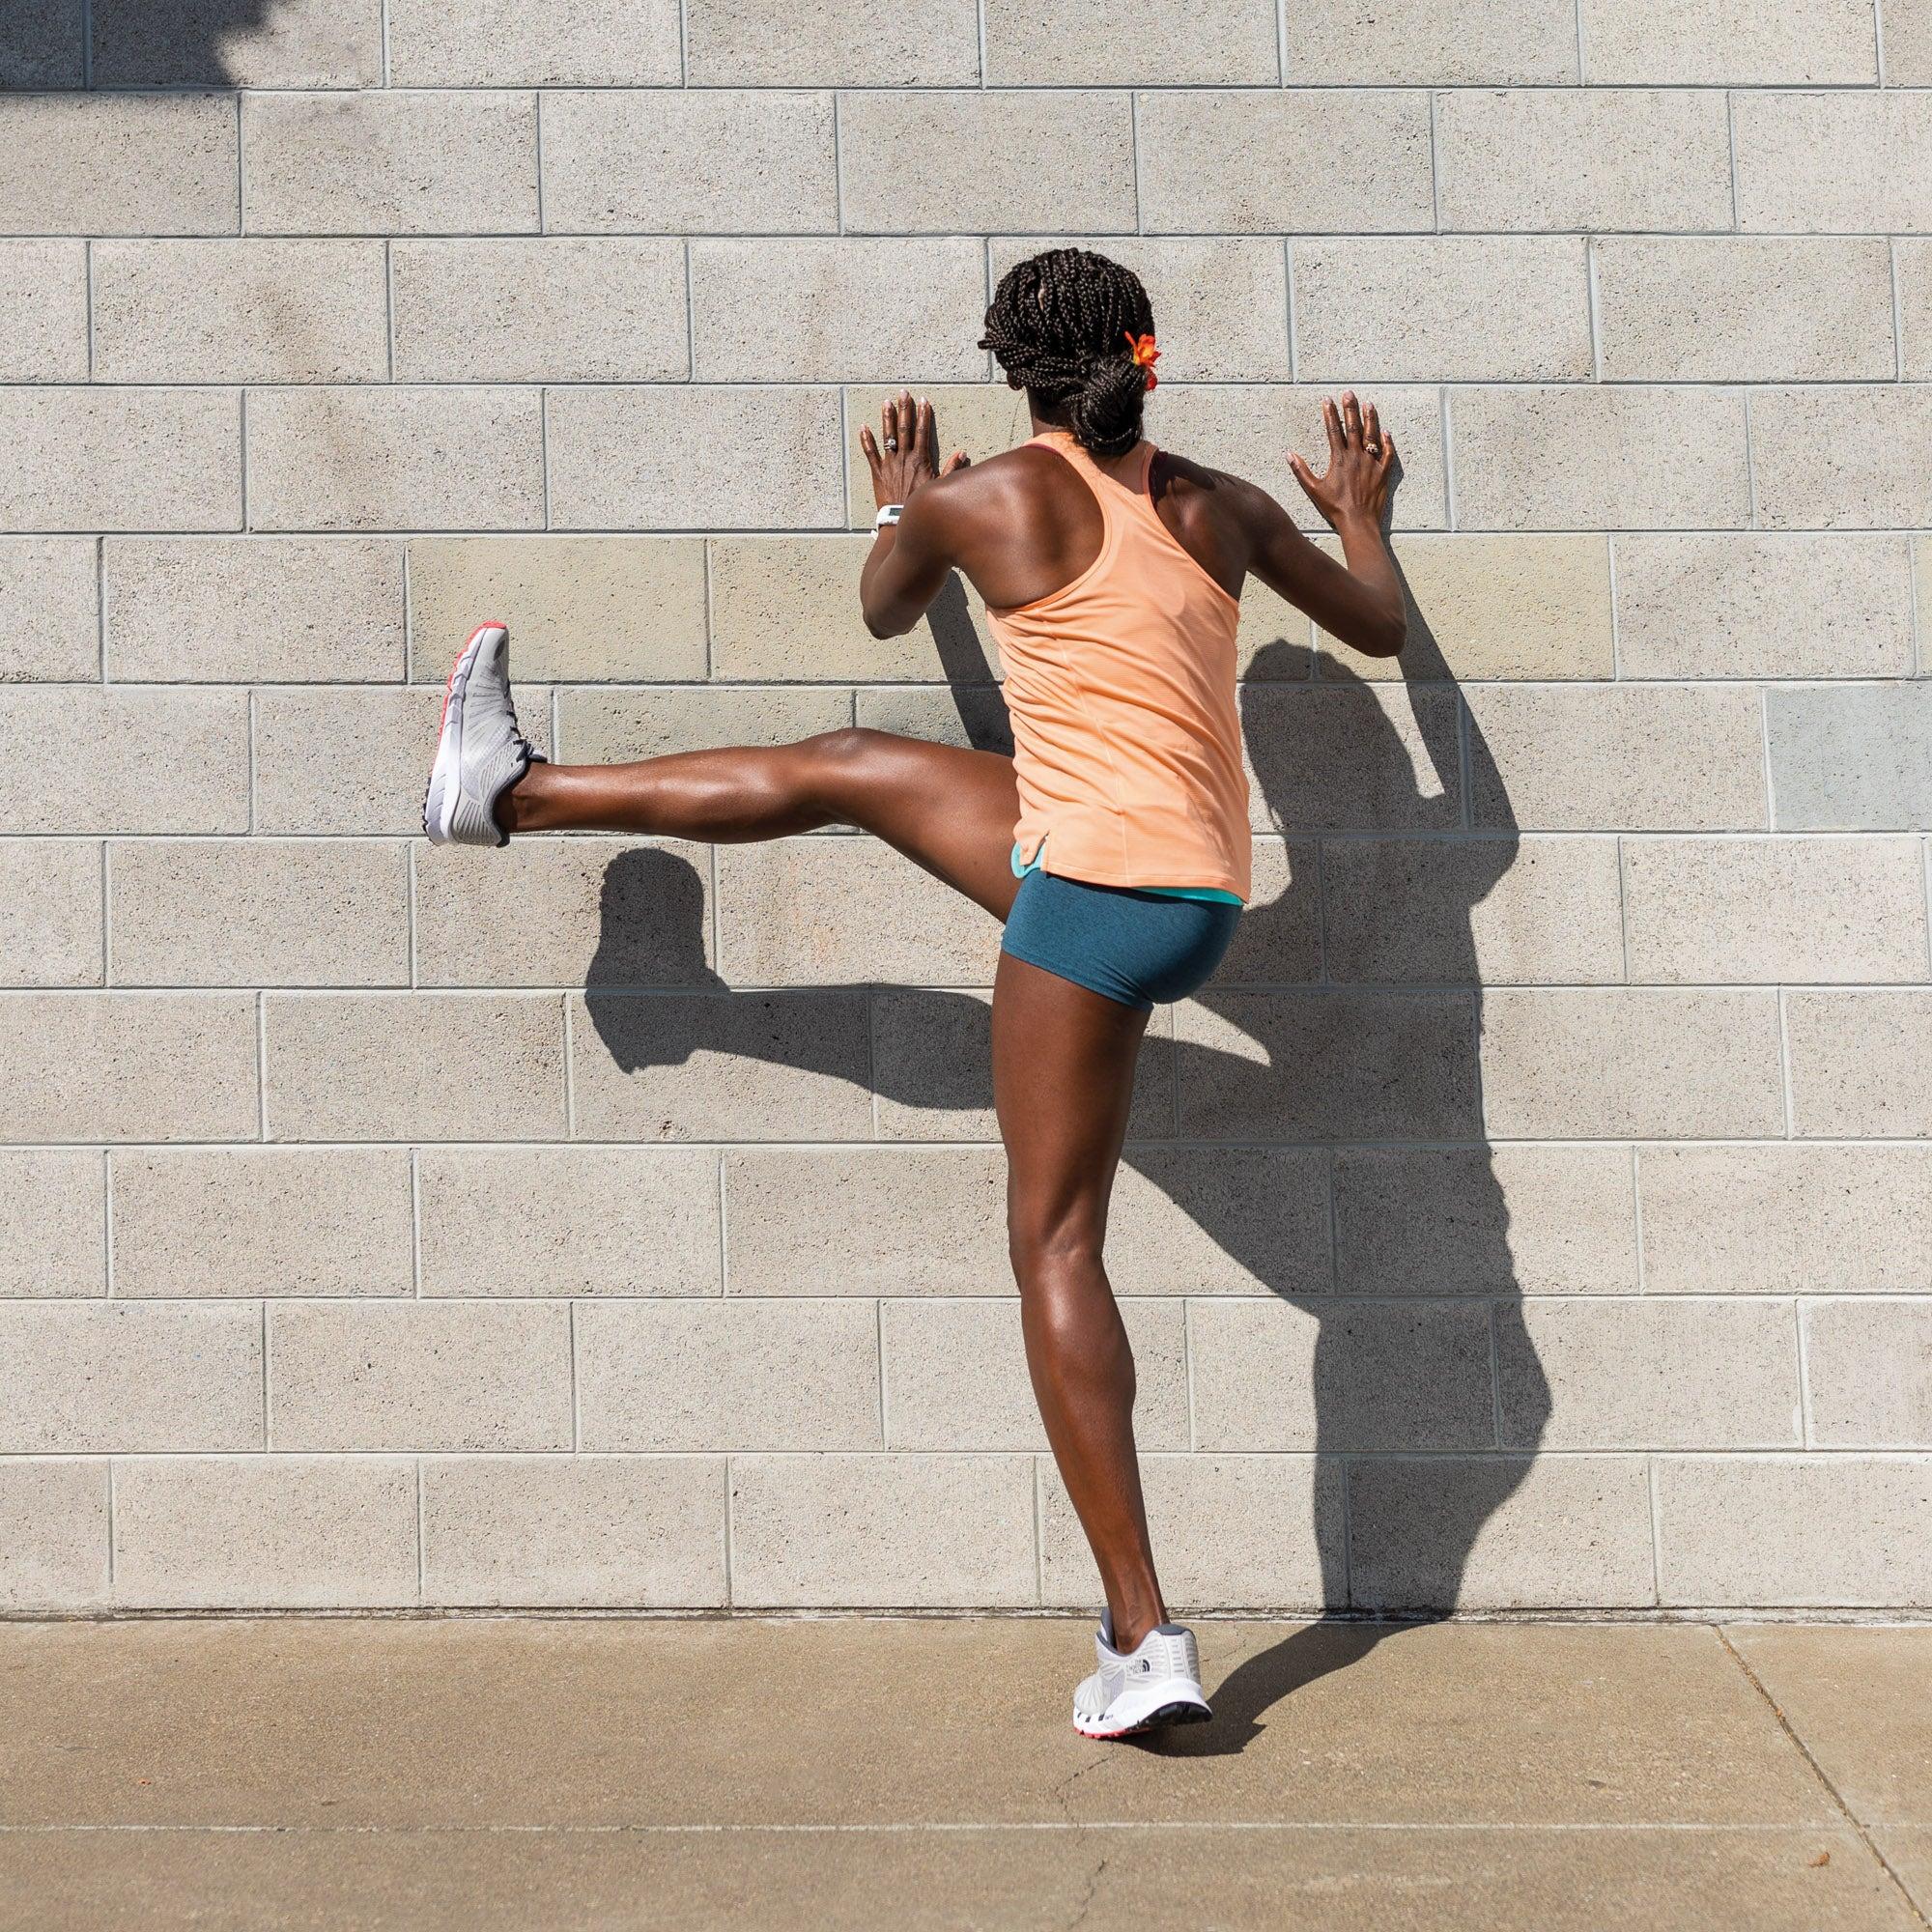 Alysia Montano demonstrating a sideways leg swing